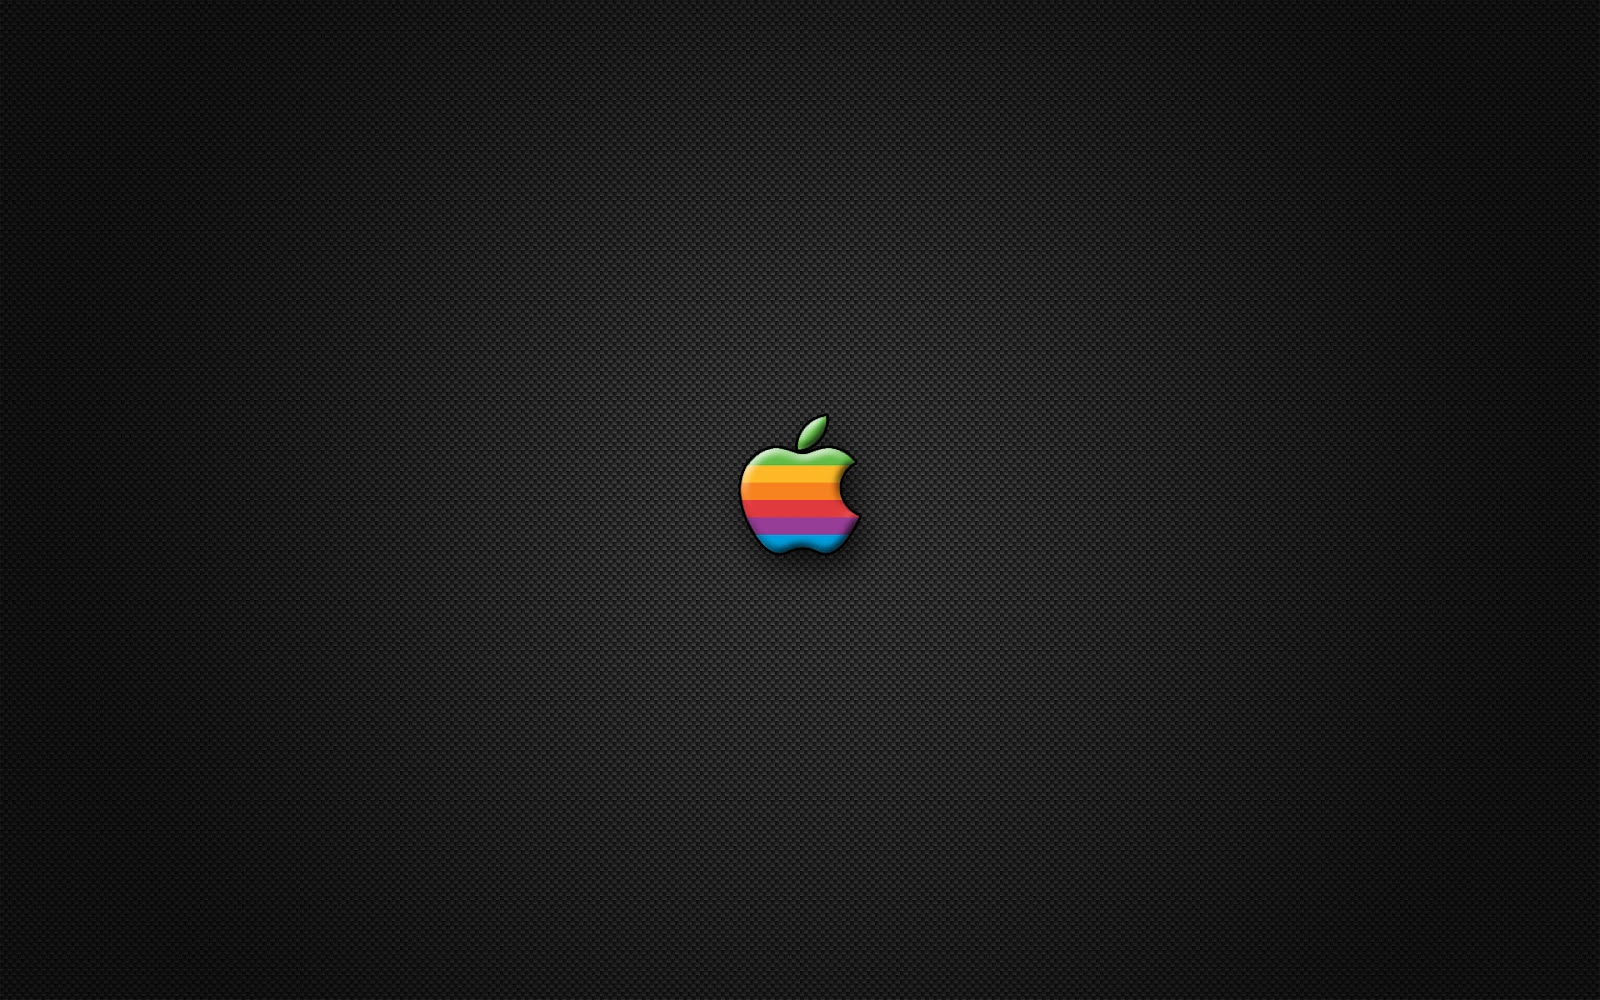 http://3.bp.blogspot.com/-Pygnm35IYY4/UDL43VZ8QzI/AAAAAAAAHfE/CDbWXv8hEDg/s1600/02-+Apple-wallpaper-hd-poster-Apple_Carbon_Fiber_Wallpaper_by_daveysaurus.jpg